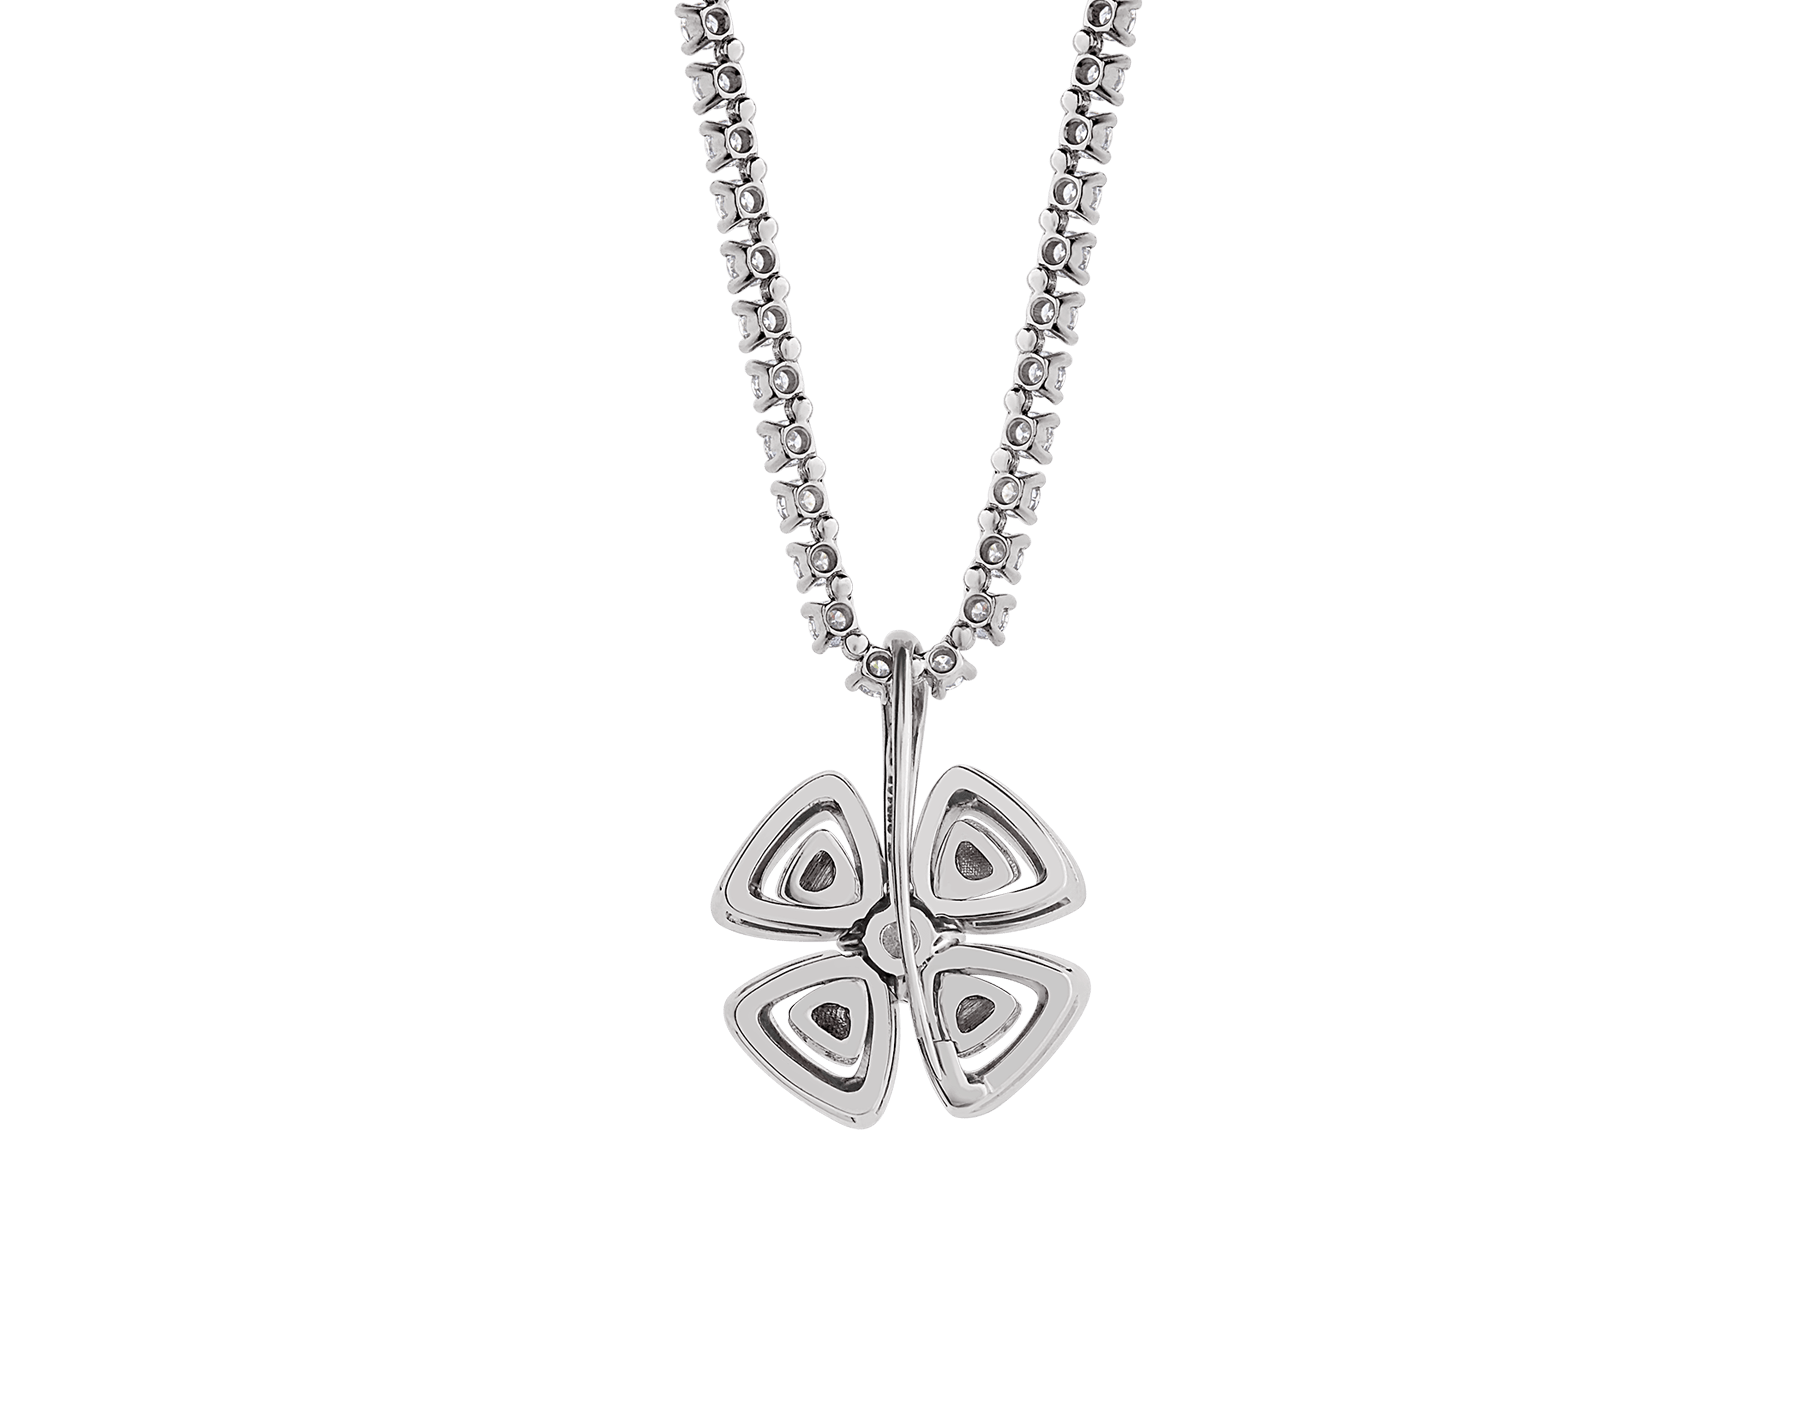 Fiorever 18 kt white gold convertible pendant necklace set with brilliant-cut diamonds (5.55 ct) and pavé diamonds (0.41 ct) 358351 image 4